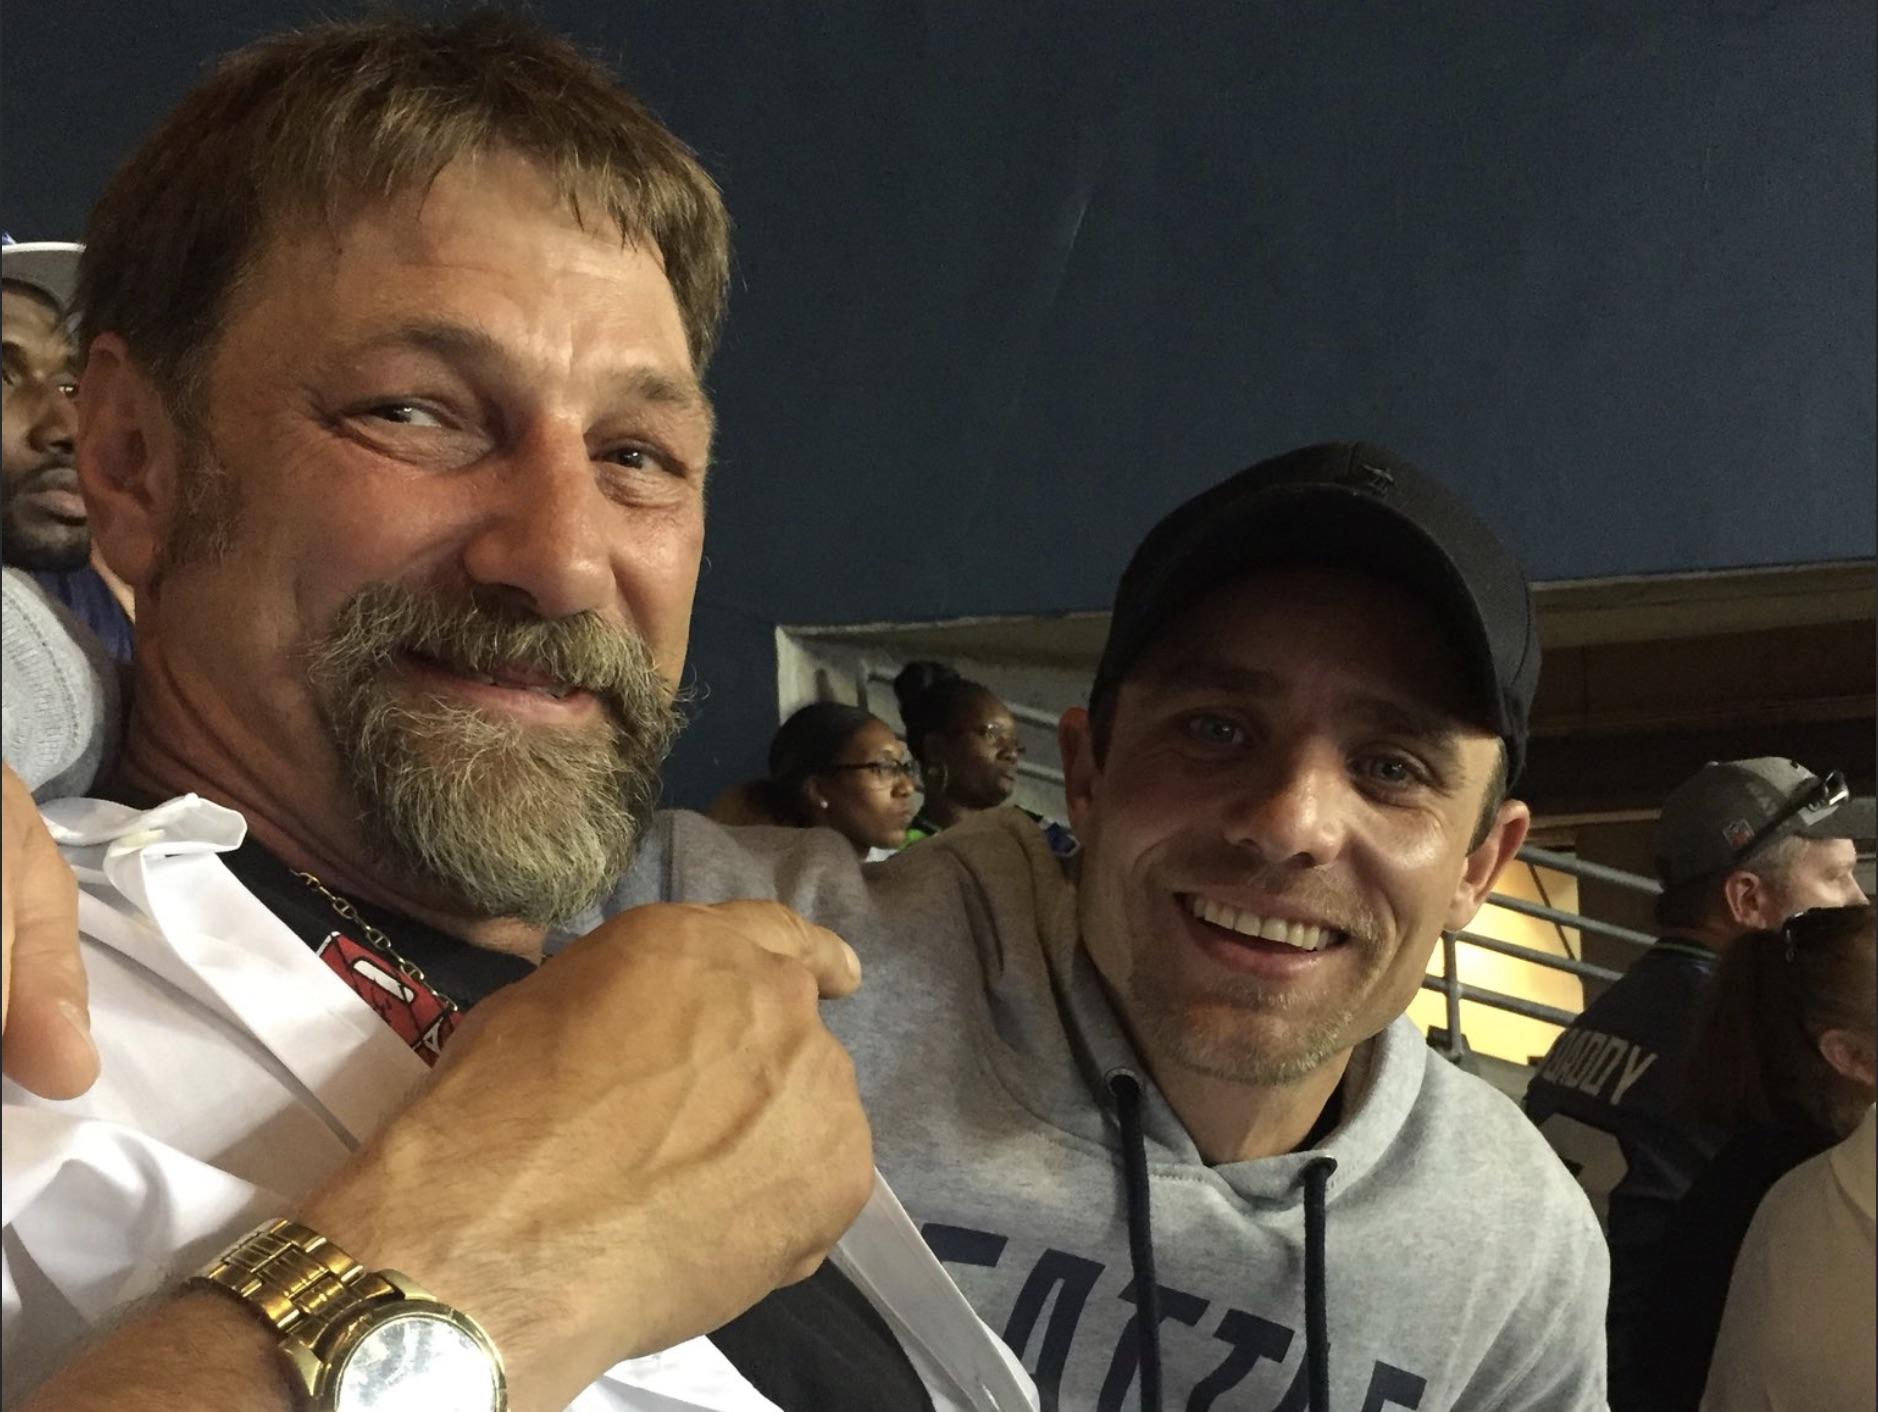 Johnathan Hillstrand, Jake Anderson, Deadliest Catch-https://twitter.com/captjohnathan/status/940698061281443840/photo/1